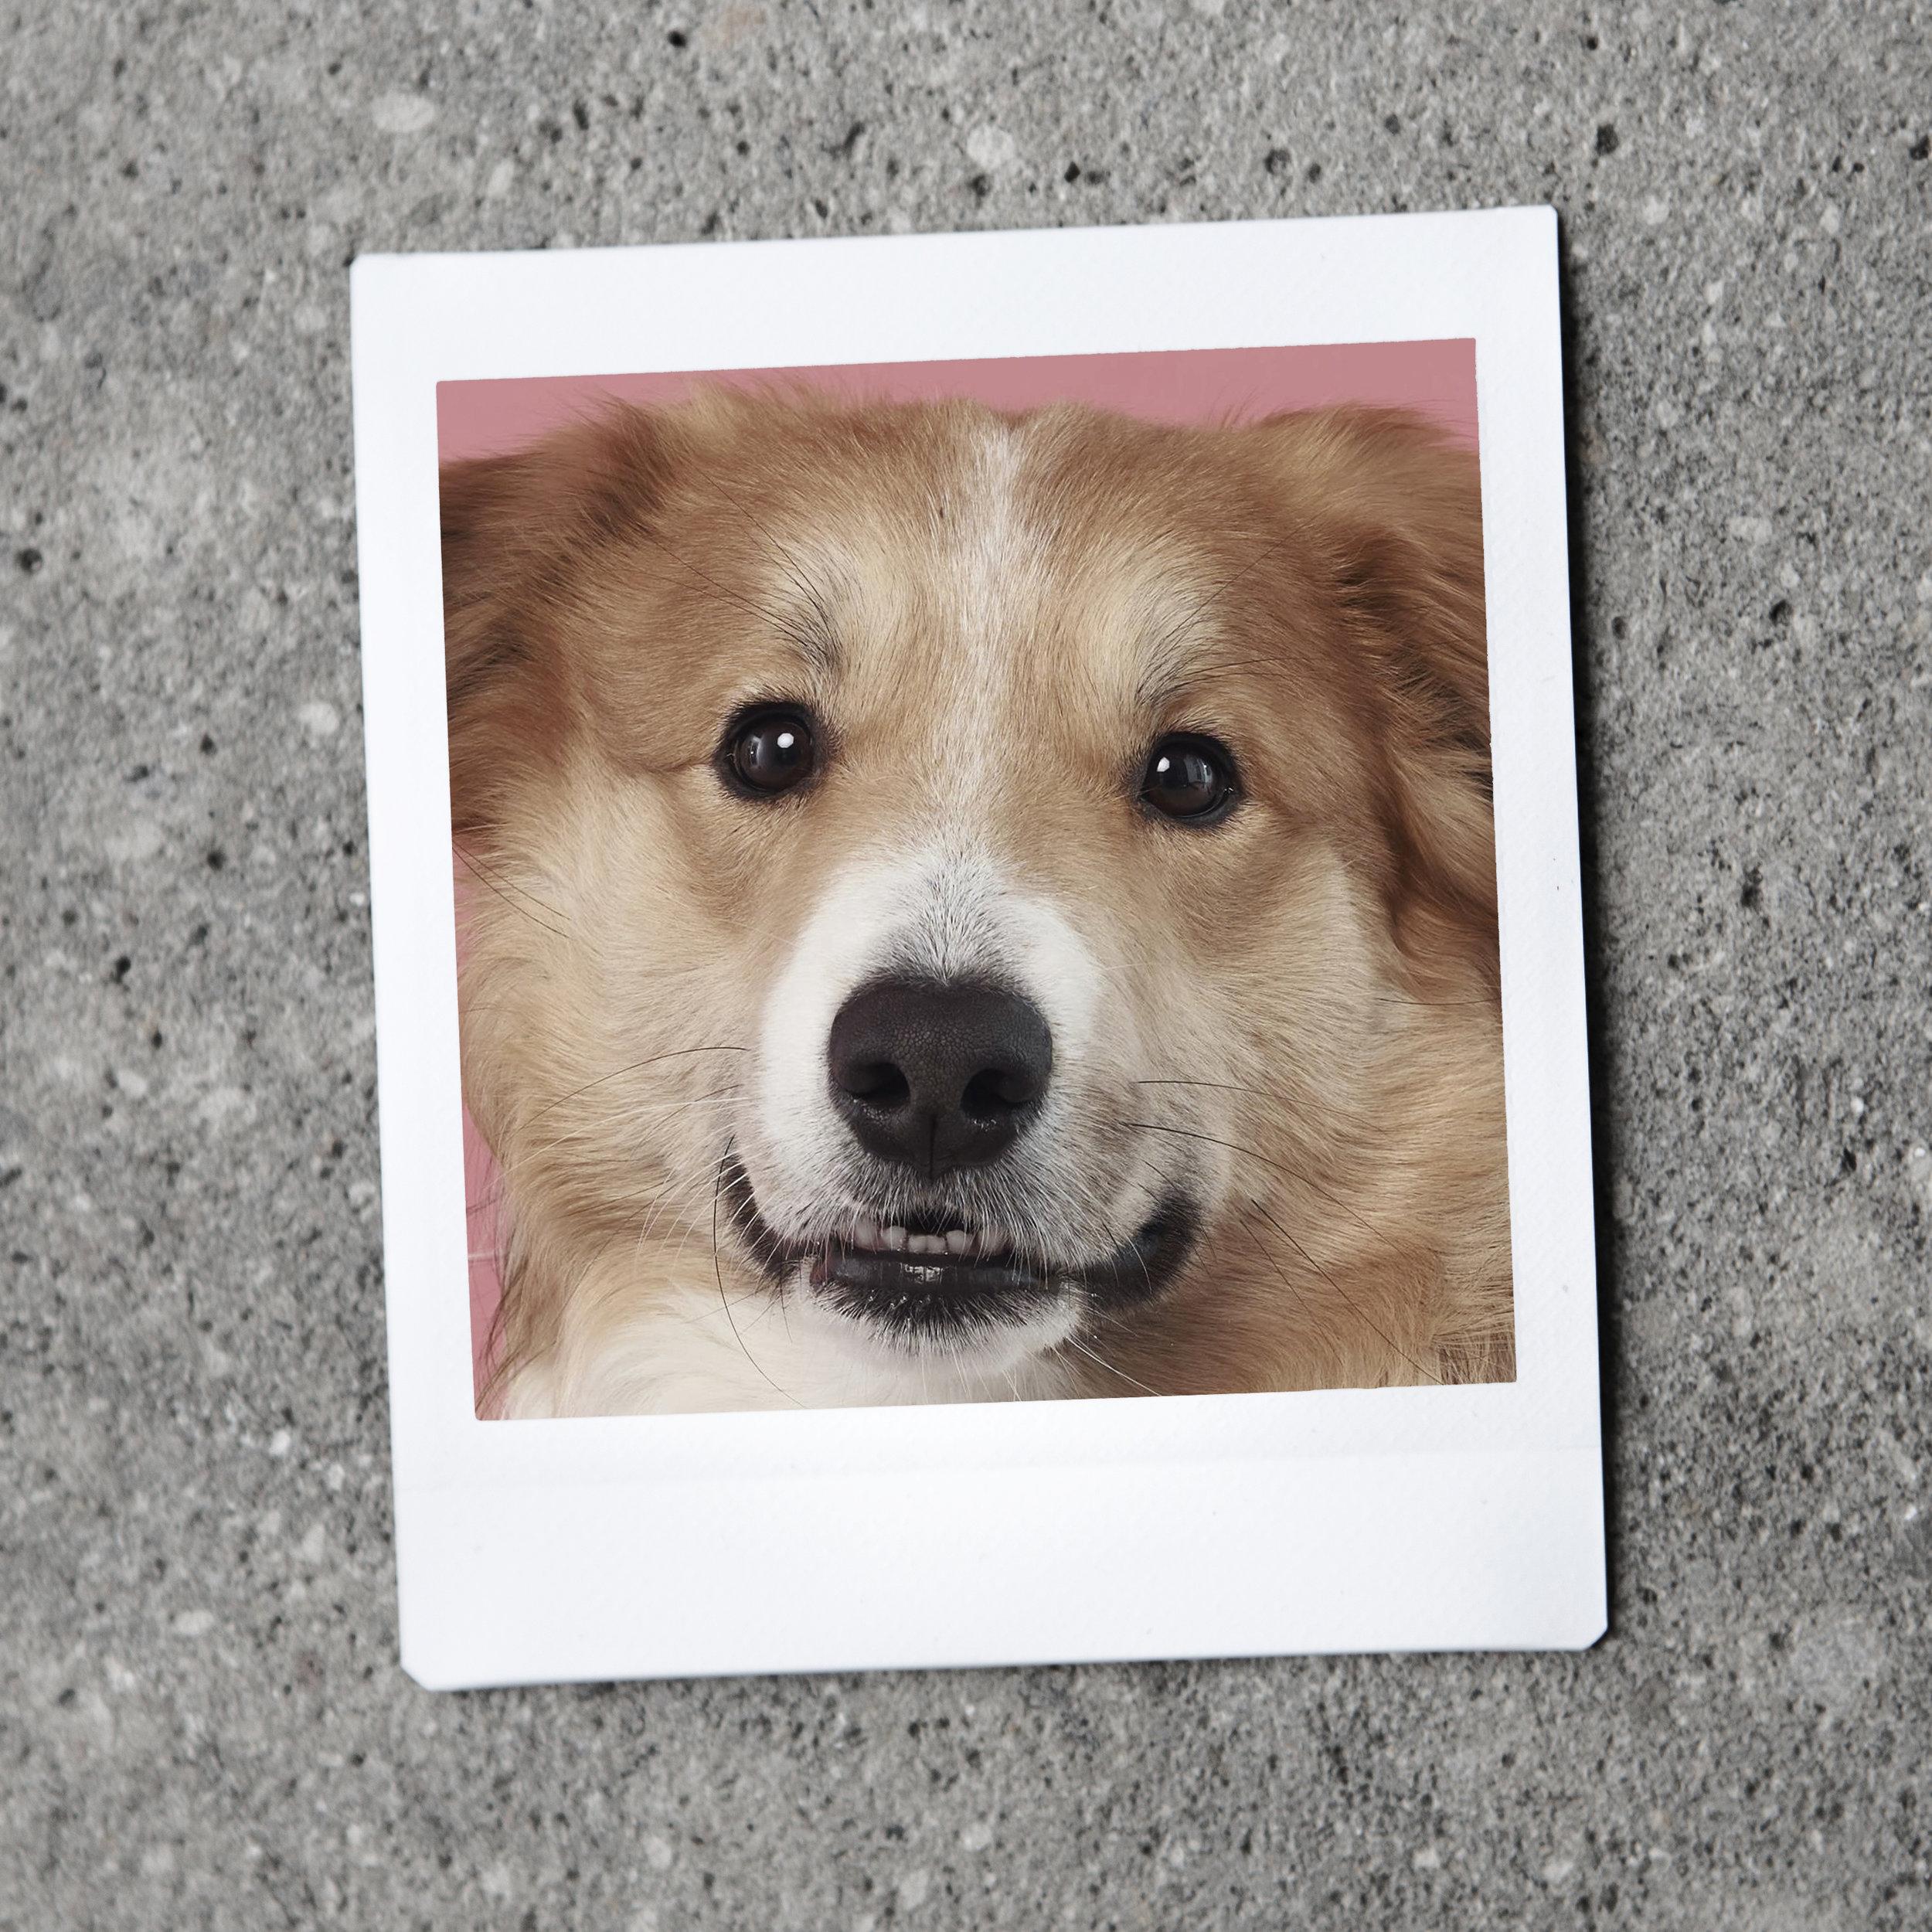 Milo - kontorhund hos Laptop Club